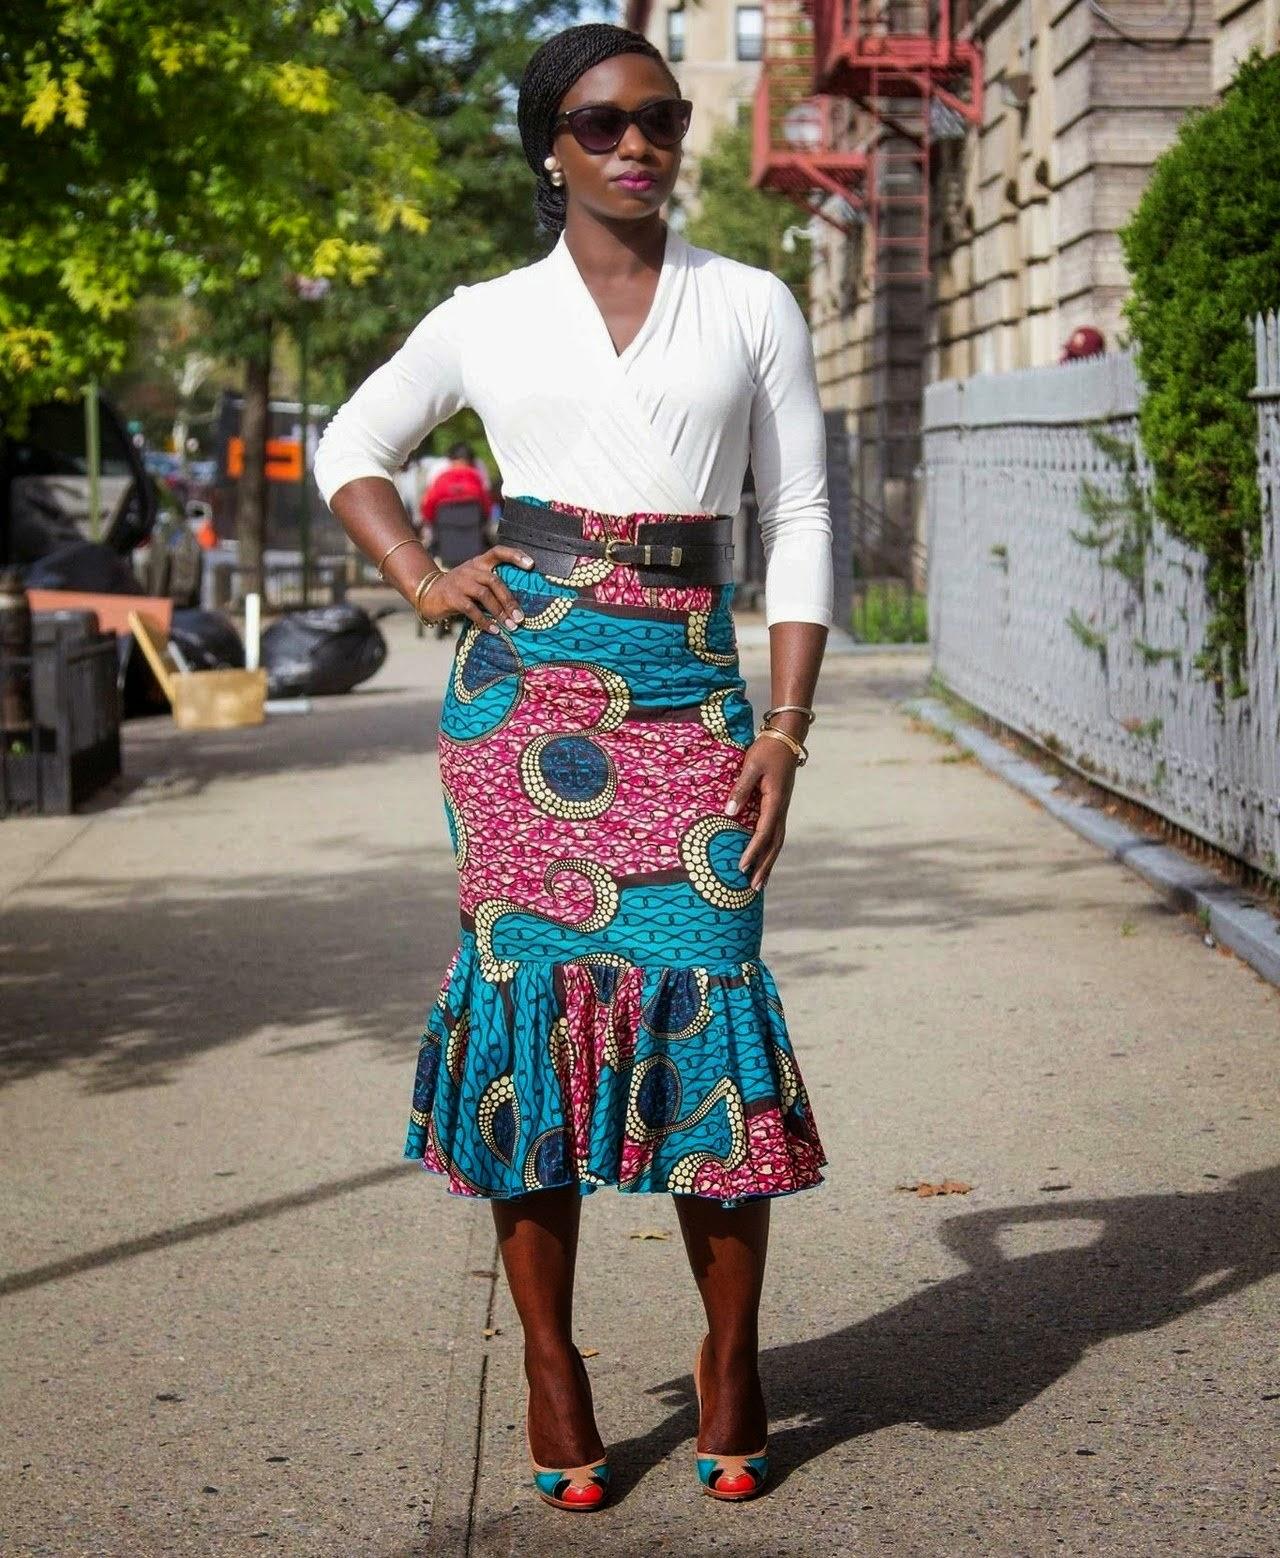 3233a5de9e142 Amazon.com: african kitenge dresses - Clothing / Women .